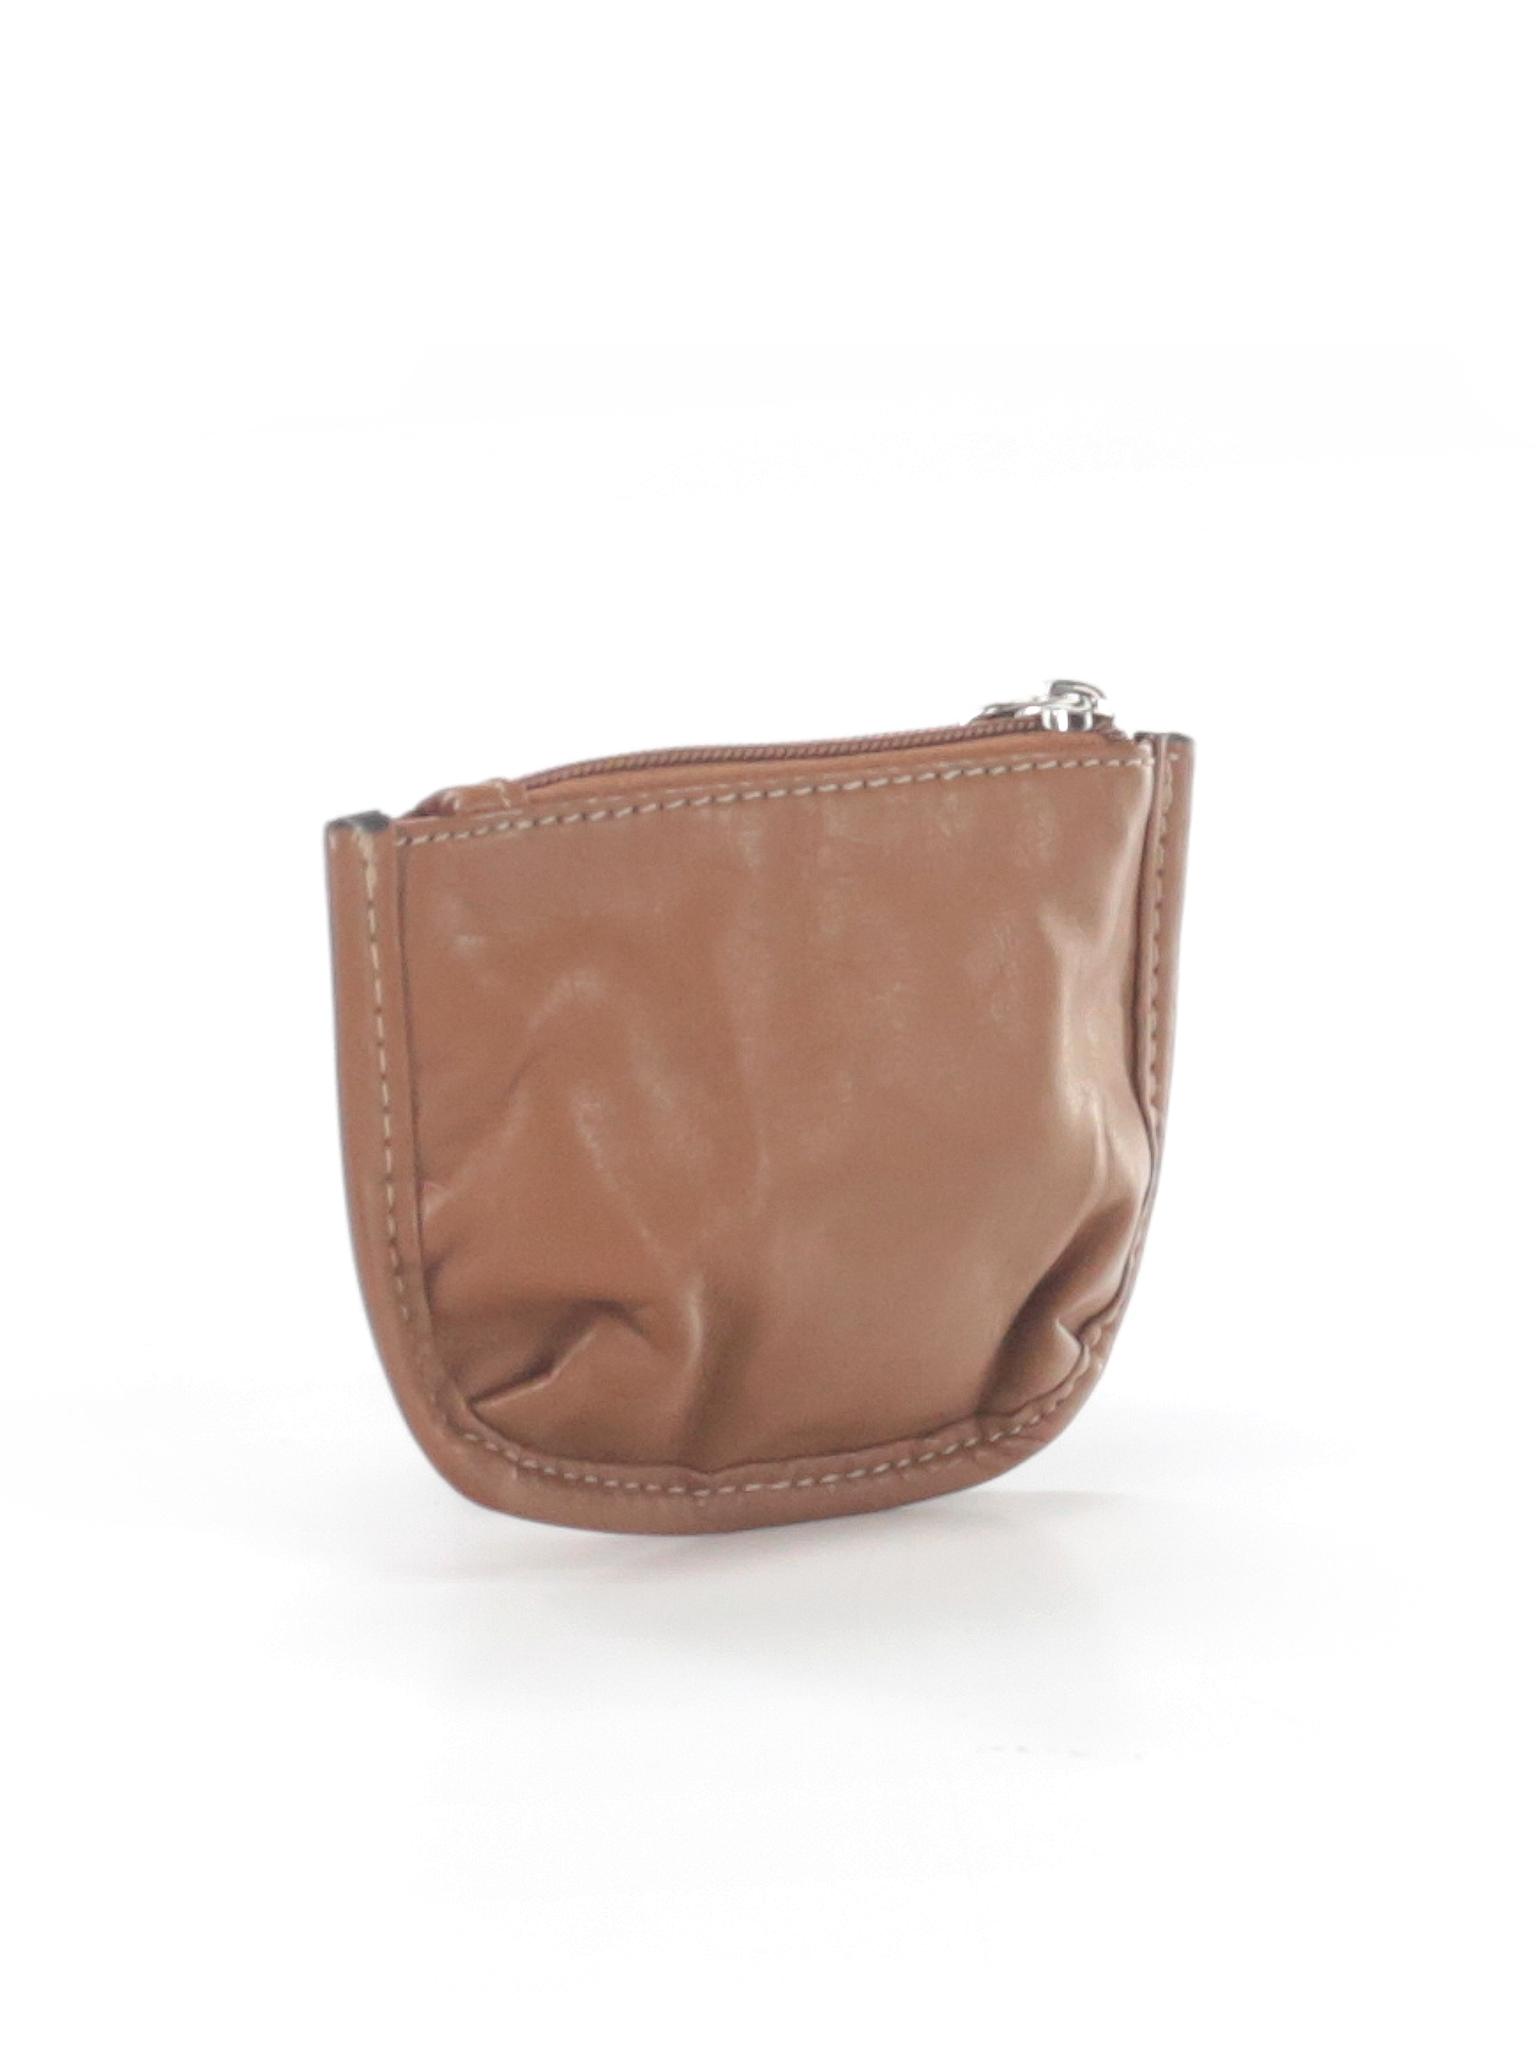 Franco sarto coin purses on sale up to off retail thredup jpg 1536x2048  Franco sarto purses 5647e6dce7239